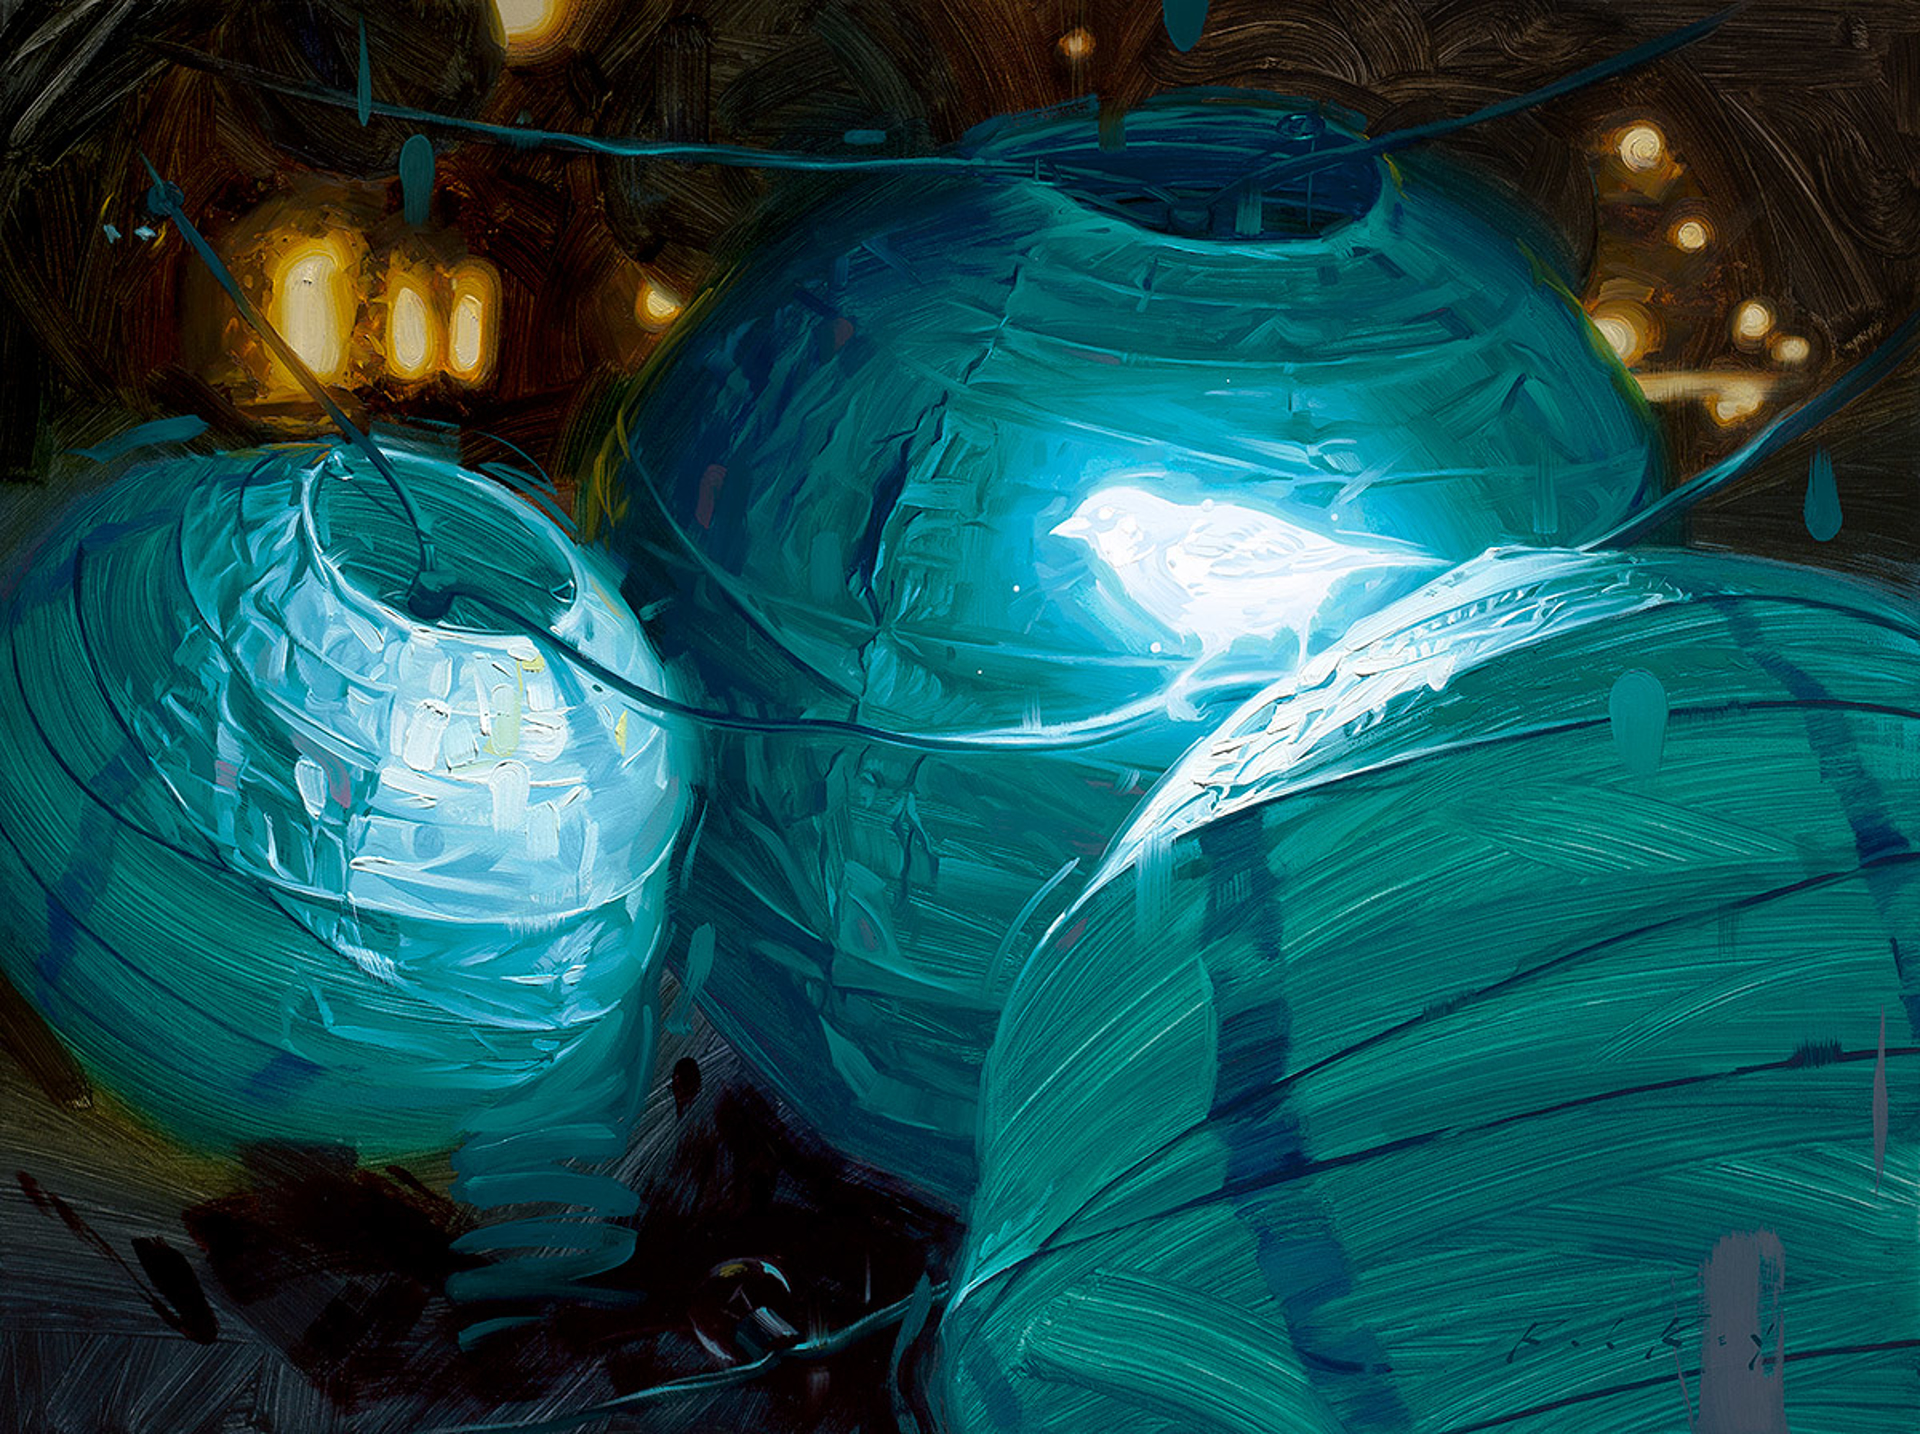 Bioluminescence IV by Rob Rey